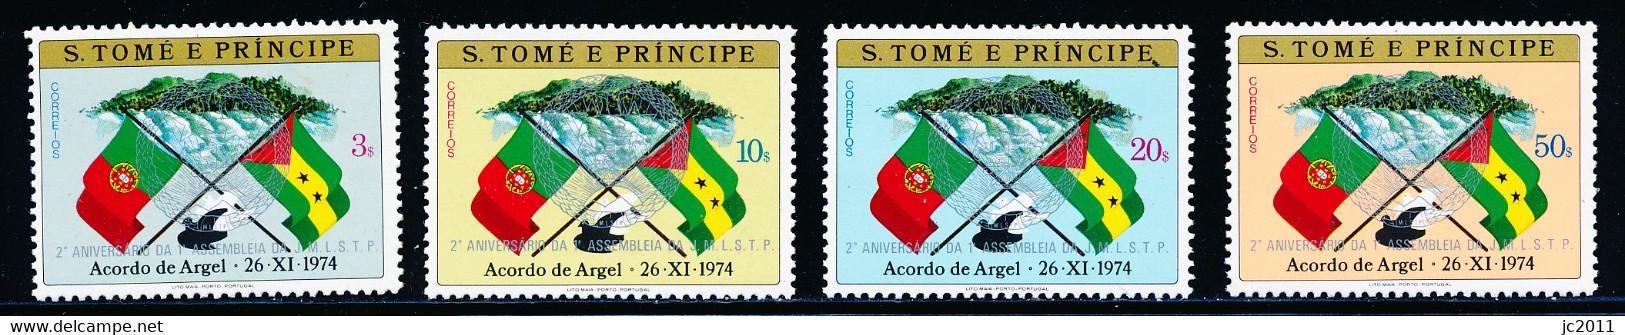 S Tomé E Príncipe - 1975 /1982 - Argel Agreement / Labor Assembly  - 1975 Type - MNH - Sao Tomé E Principe